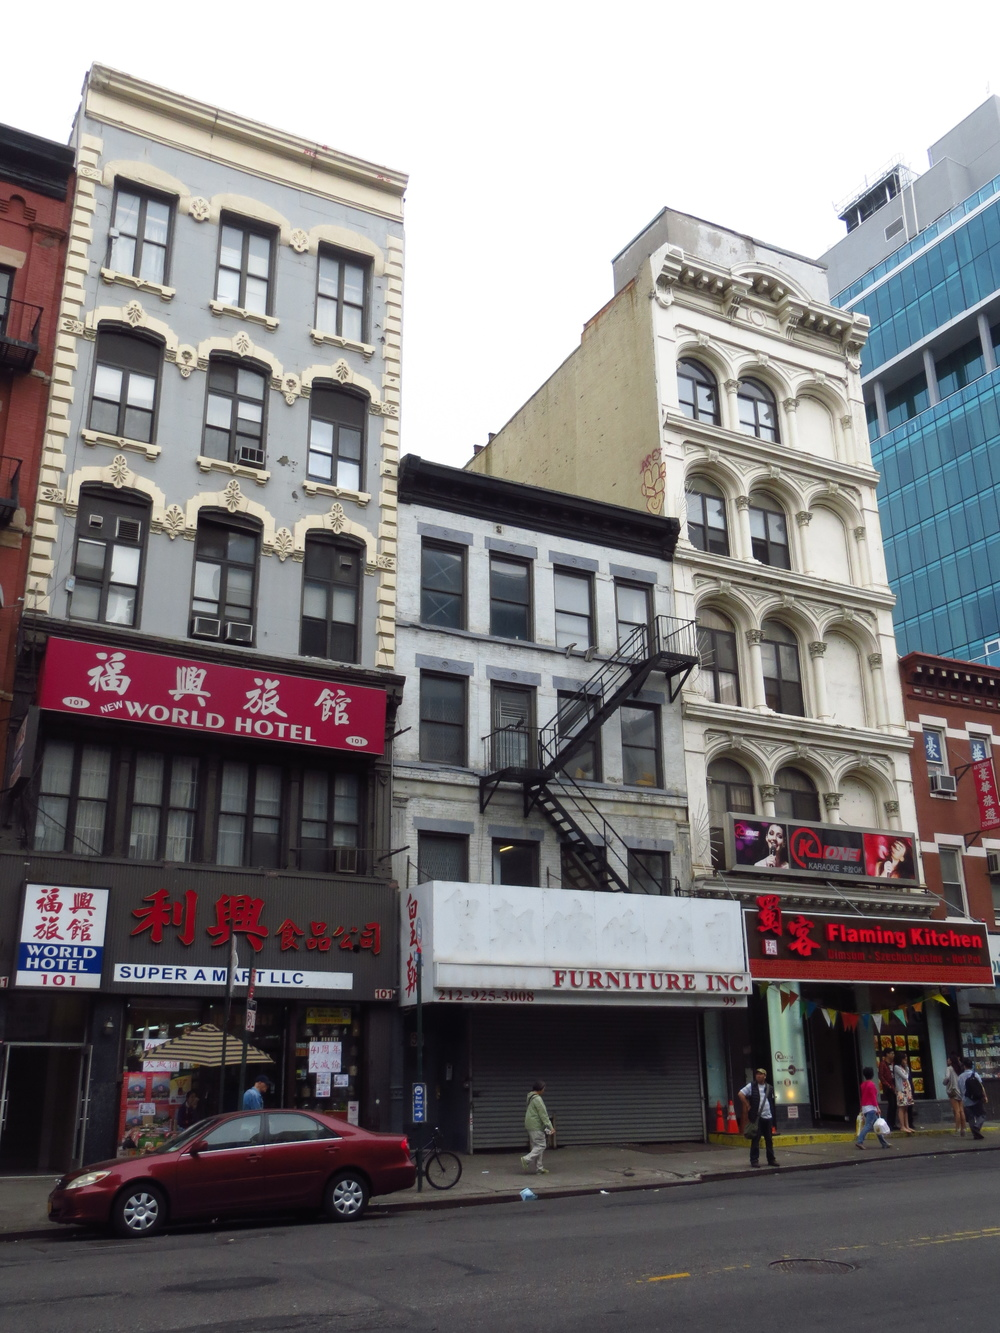 Bowery buildings